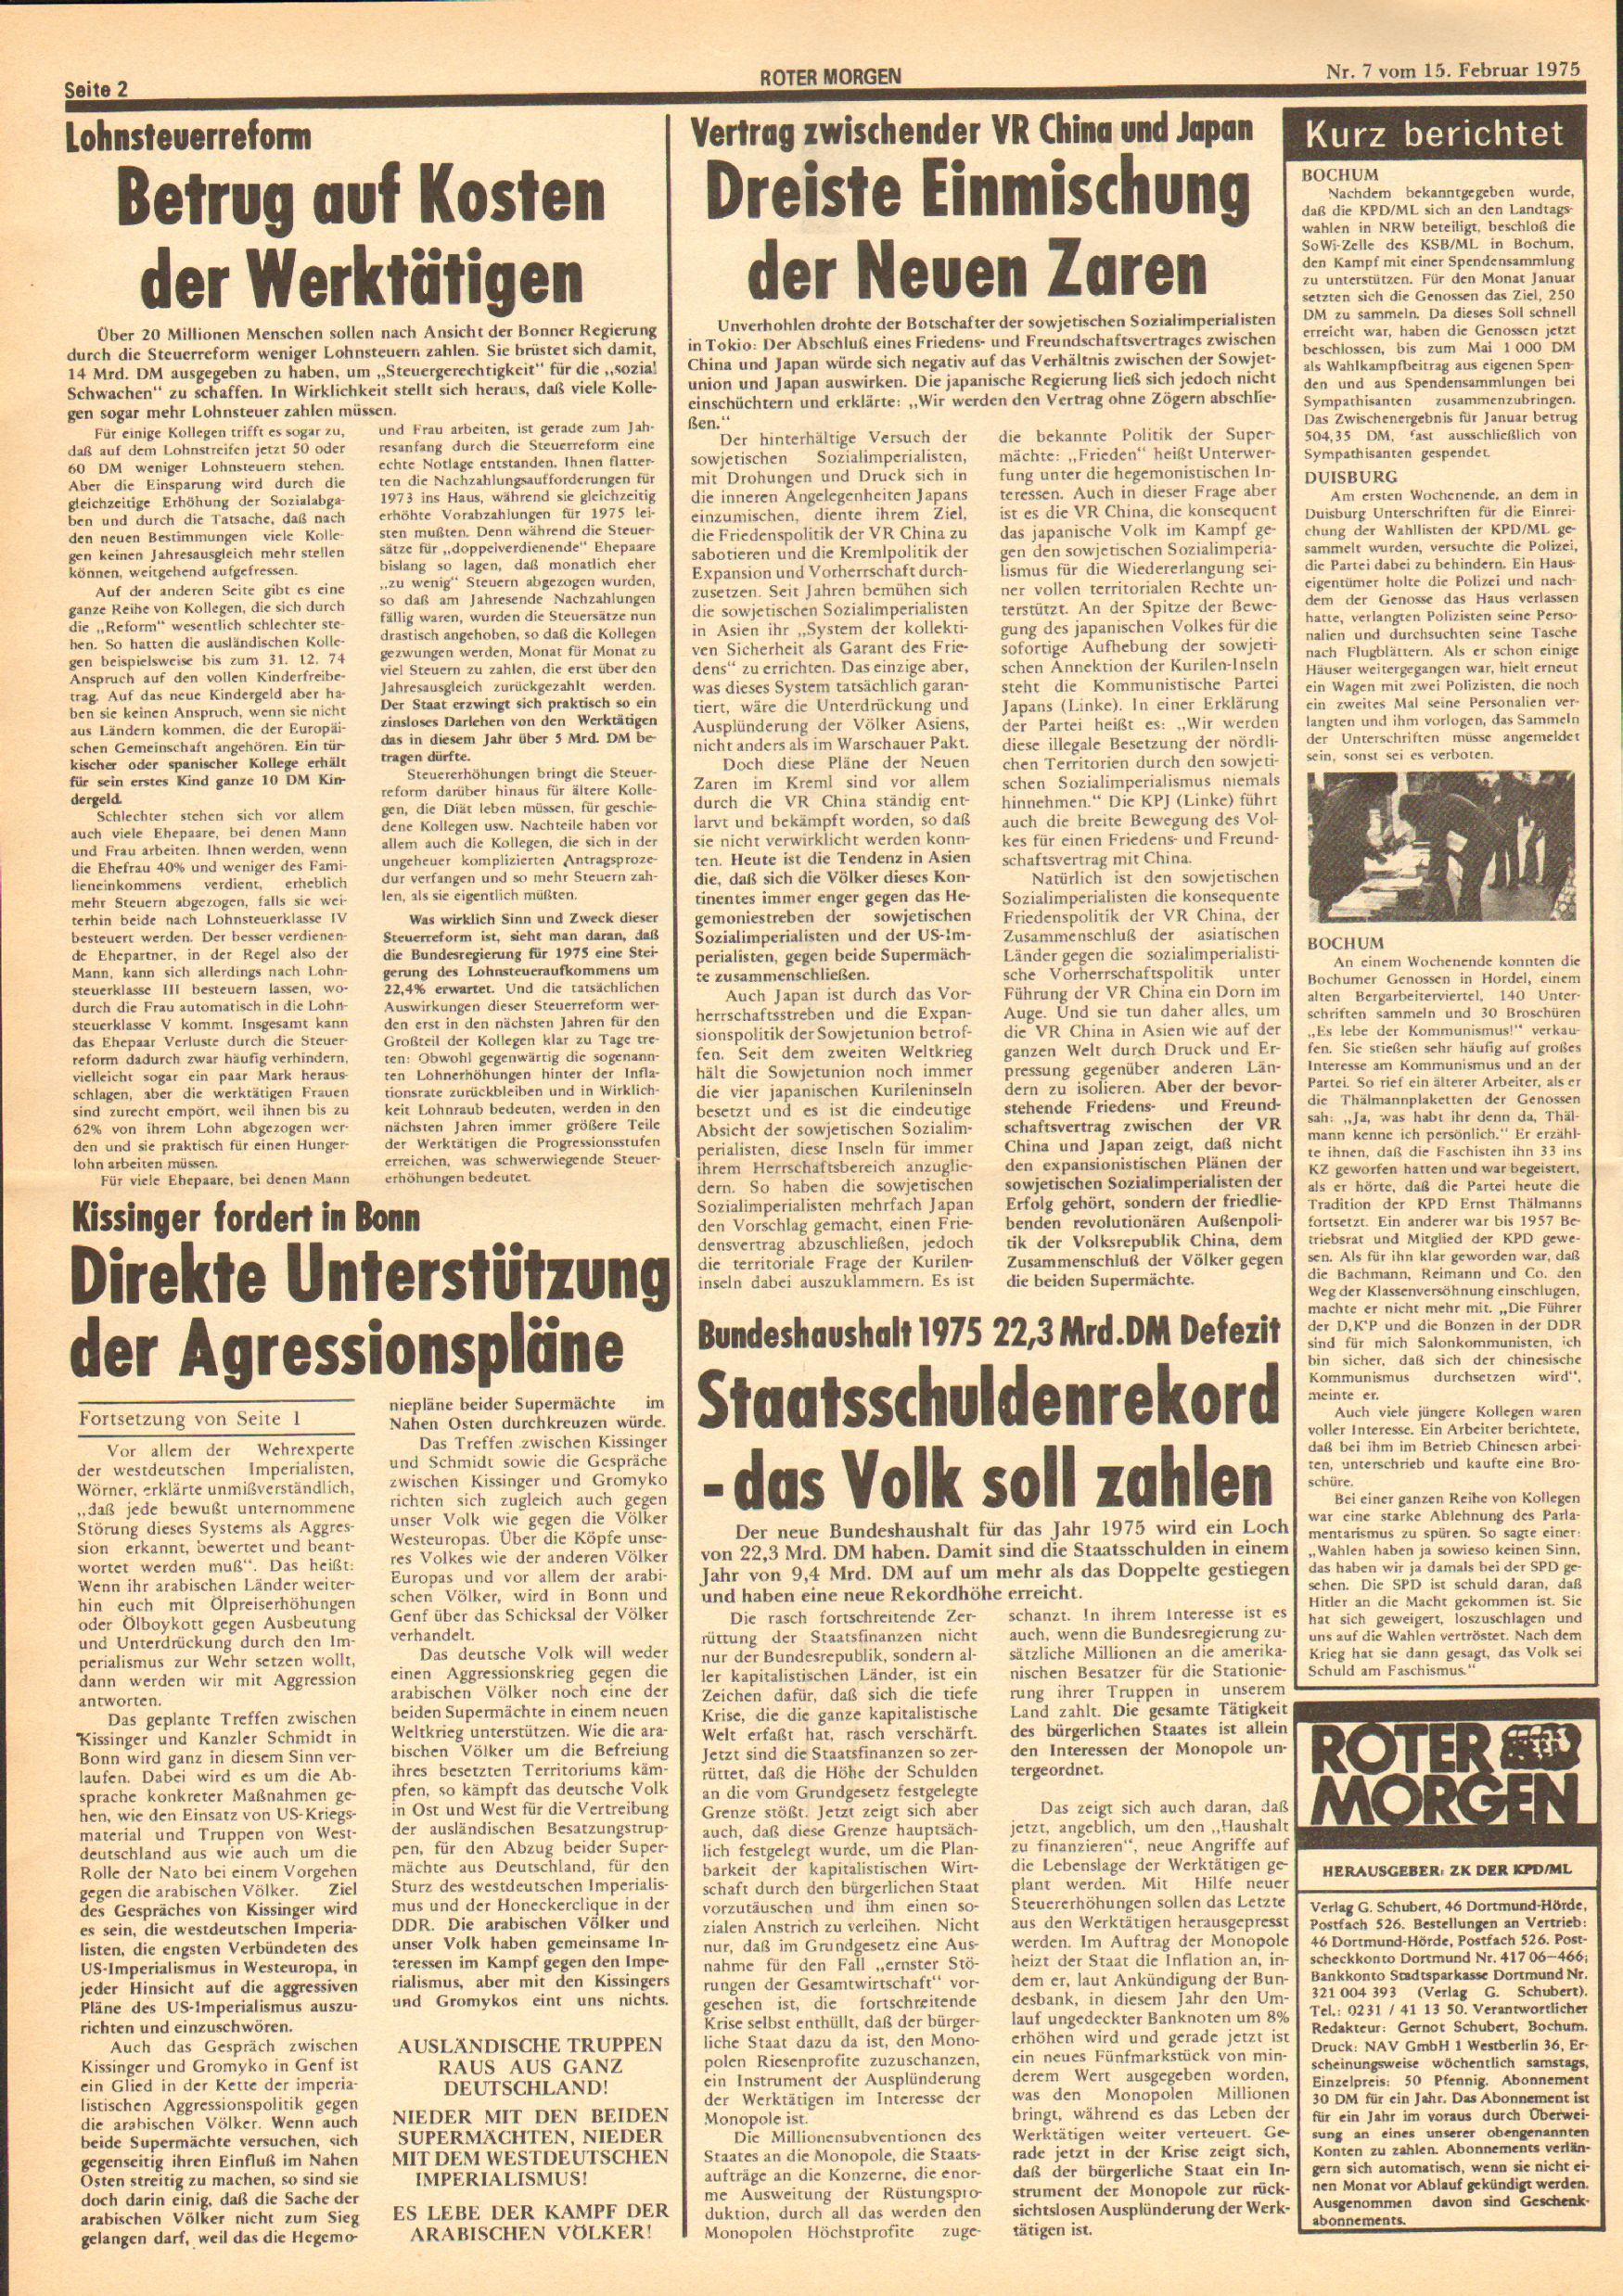 Roter Morgen, 9. Jg., 15. Februar 1975, Nr. 7, Seite 2